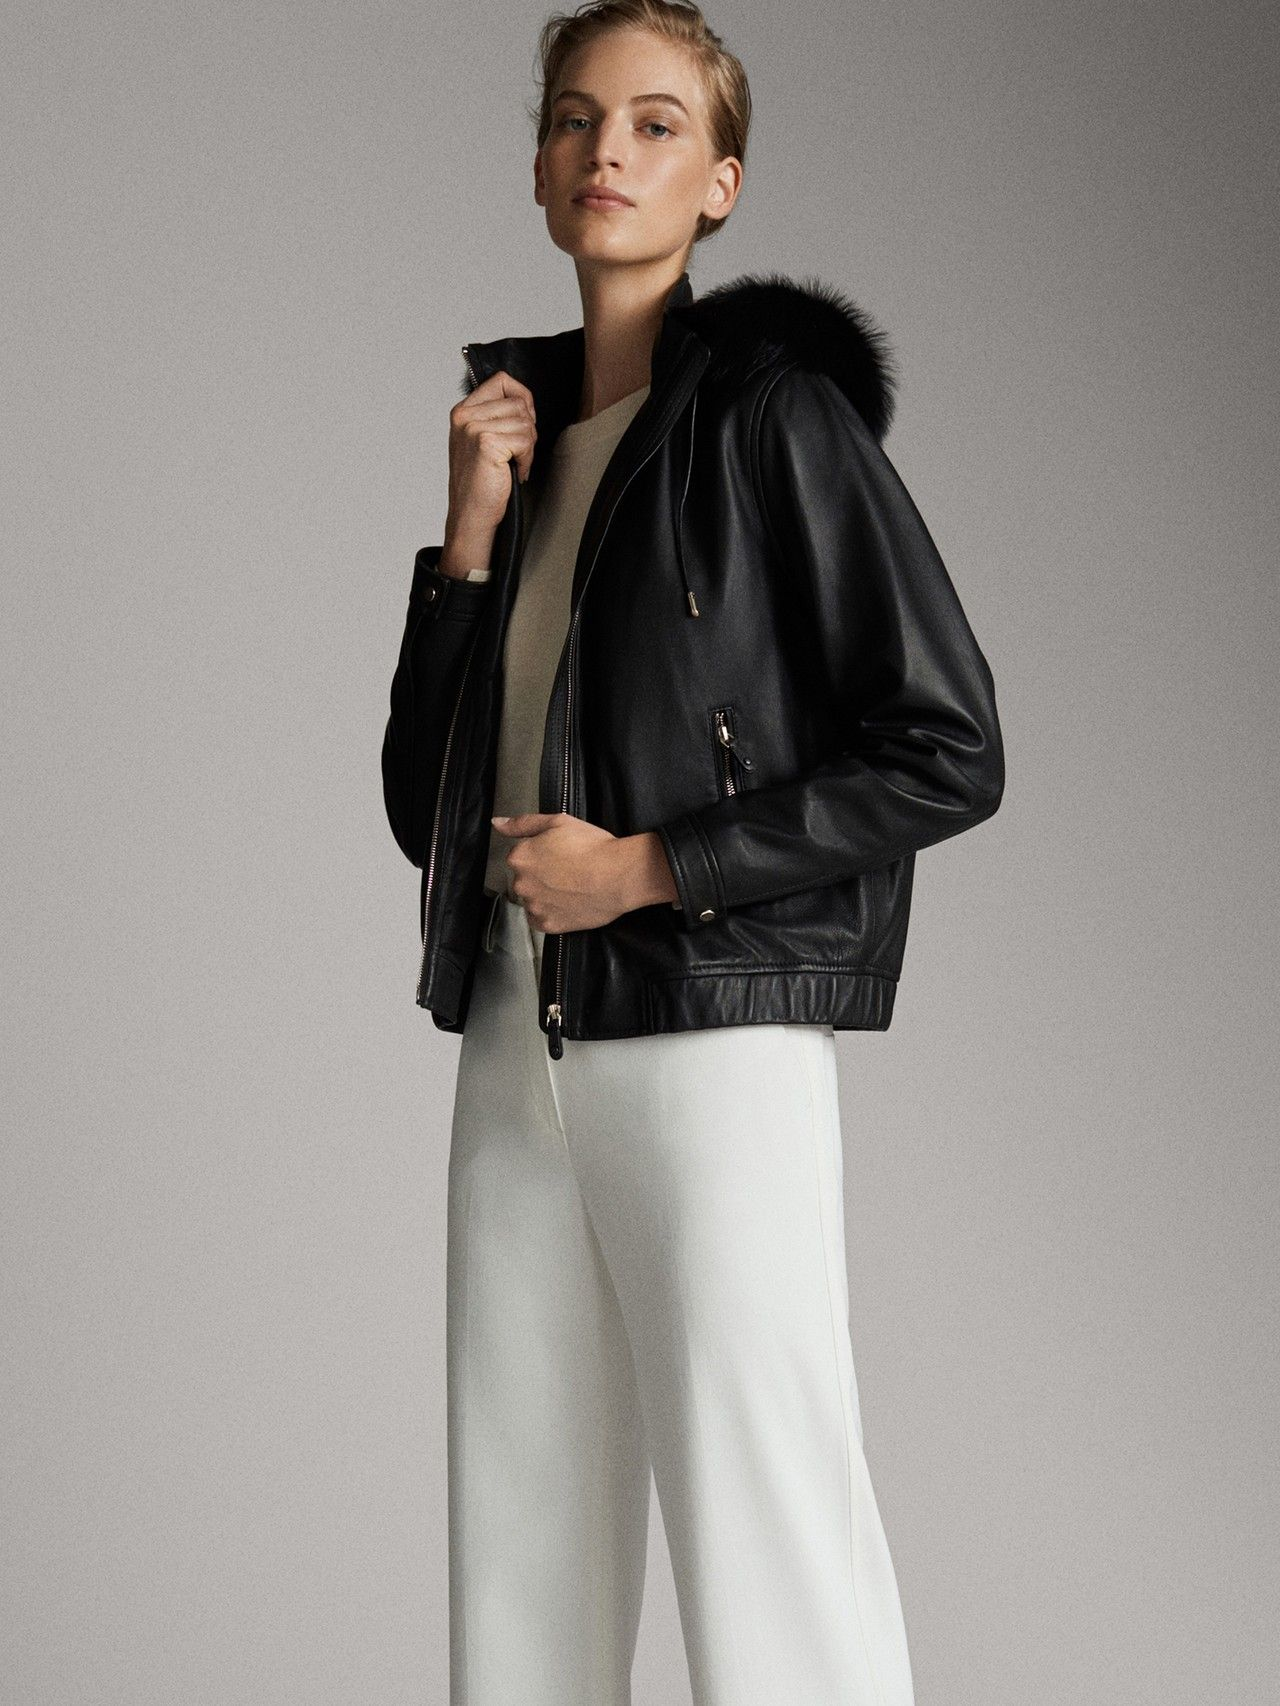 Chaqueta negra acolchada con piel. mujer | MecShopping